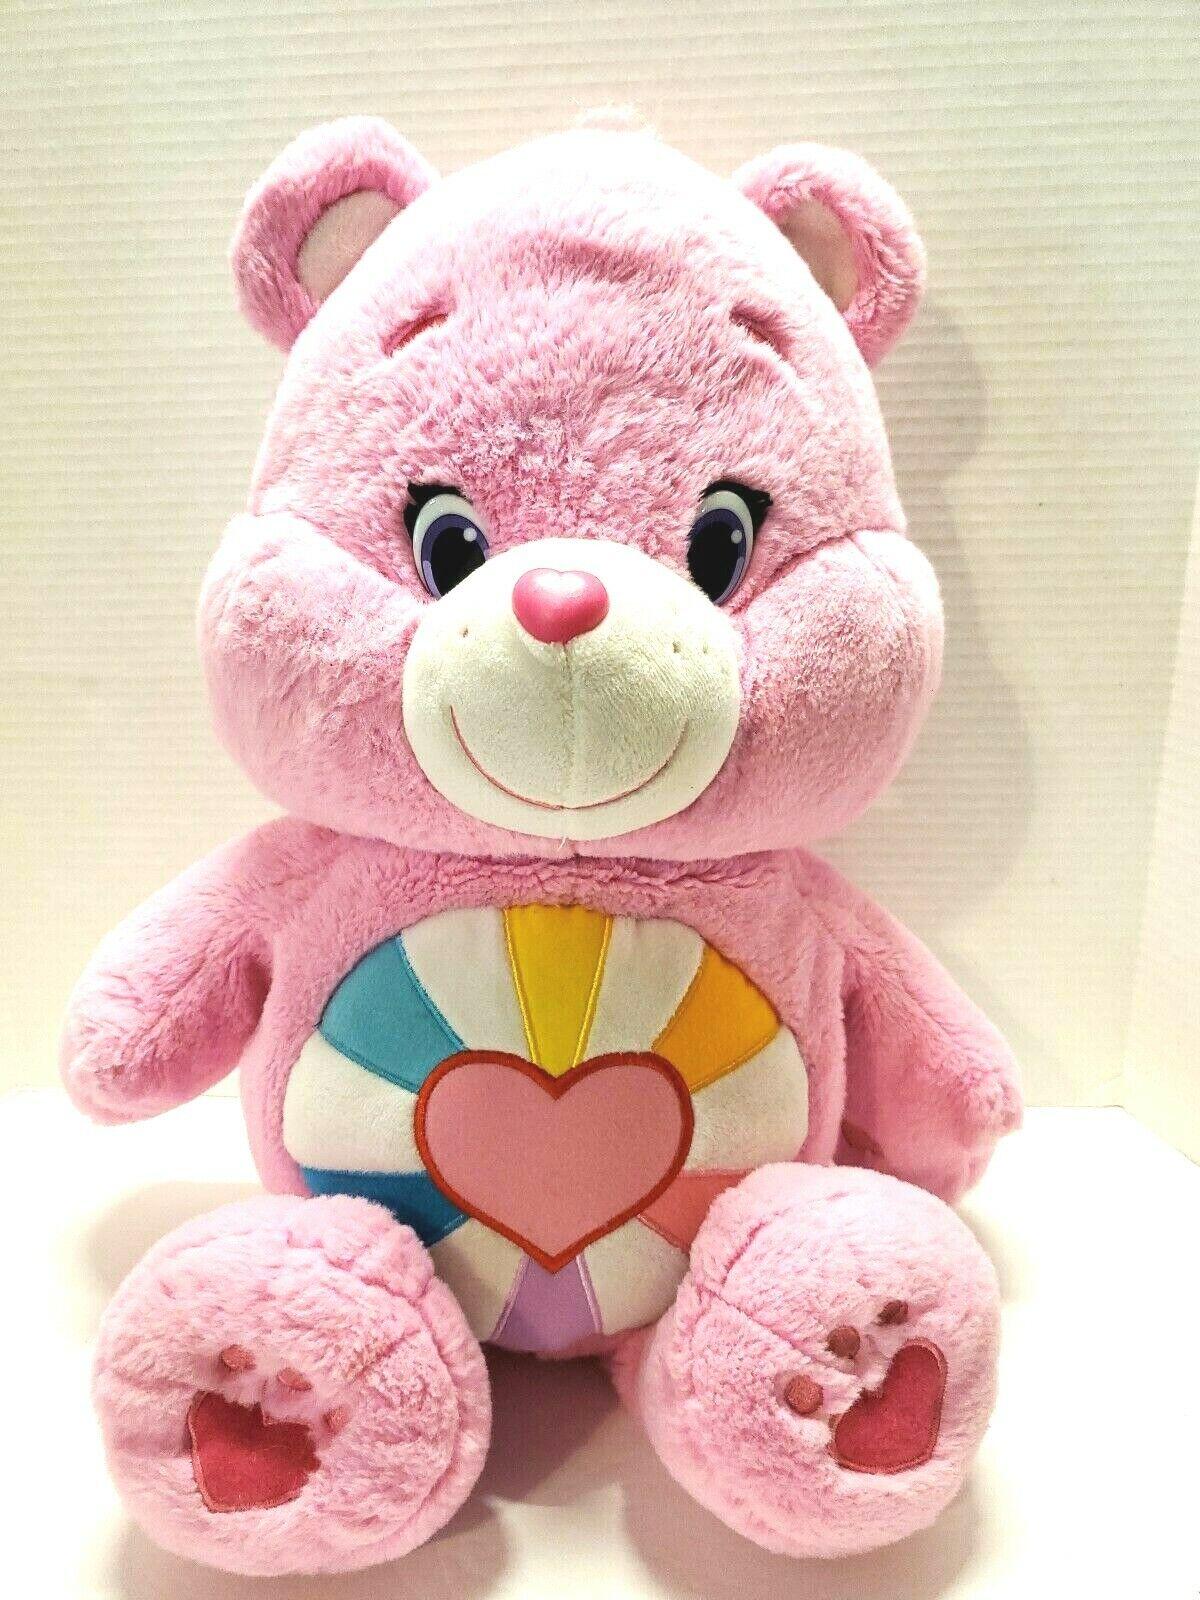 Message Recorder Stuffed Animals, Hopeful Heart Care Bear Pink Heart Rainbow Plush Stuffed Animal 20 For Sale Online